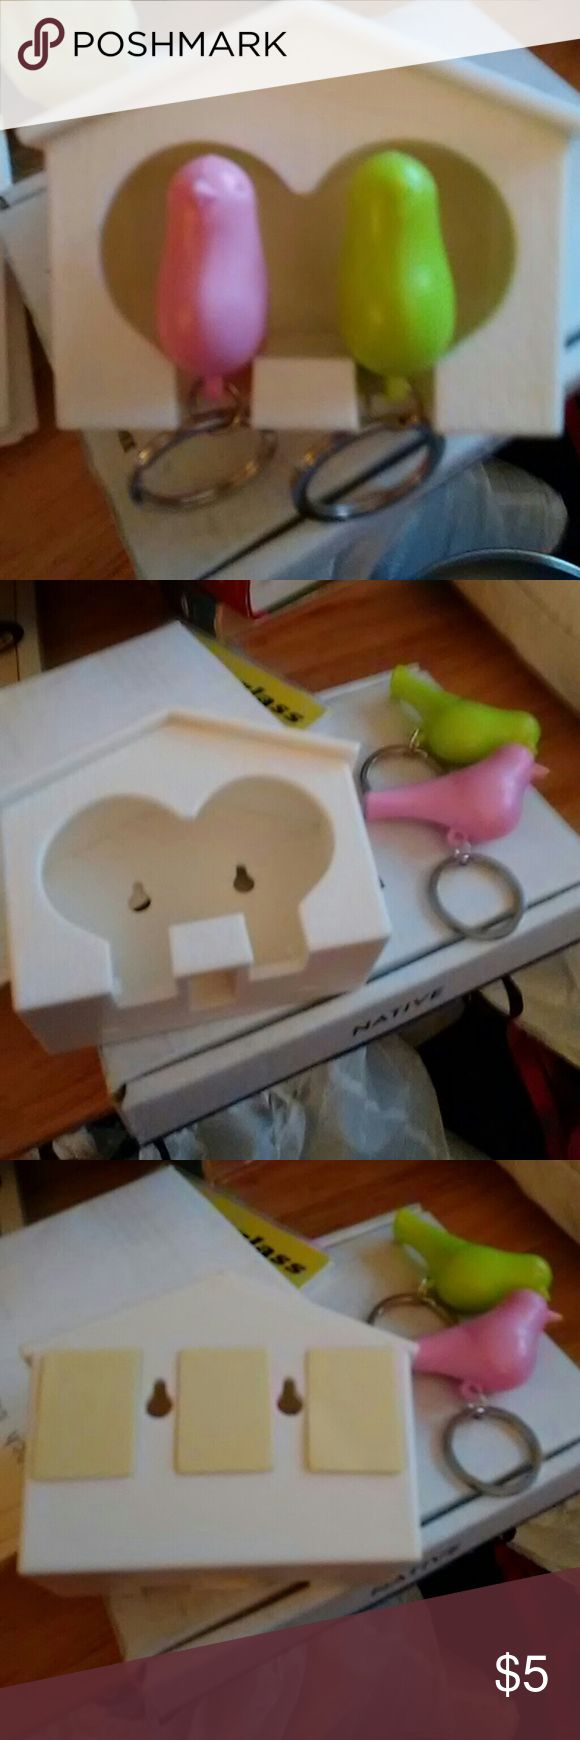 best 25 self taping screws ideas on pinterest small plastic